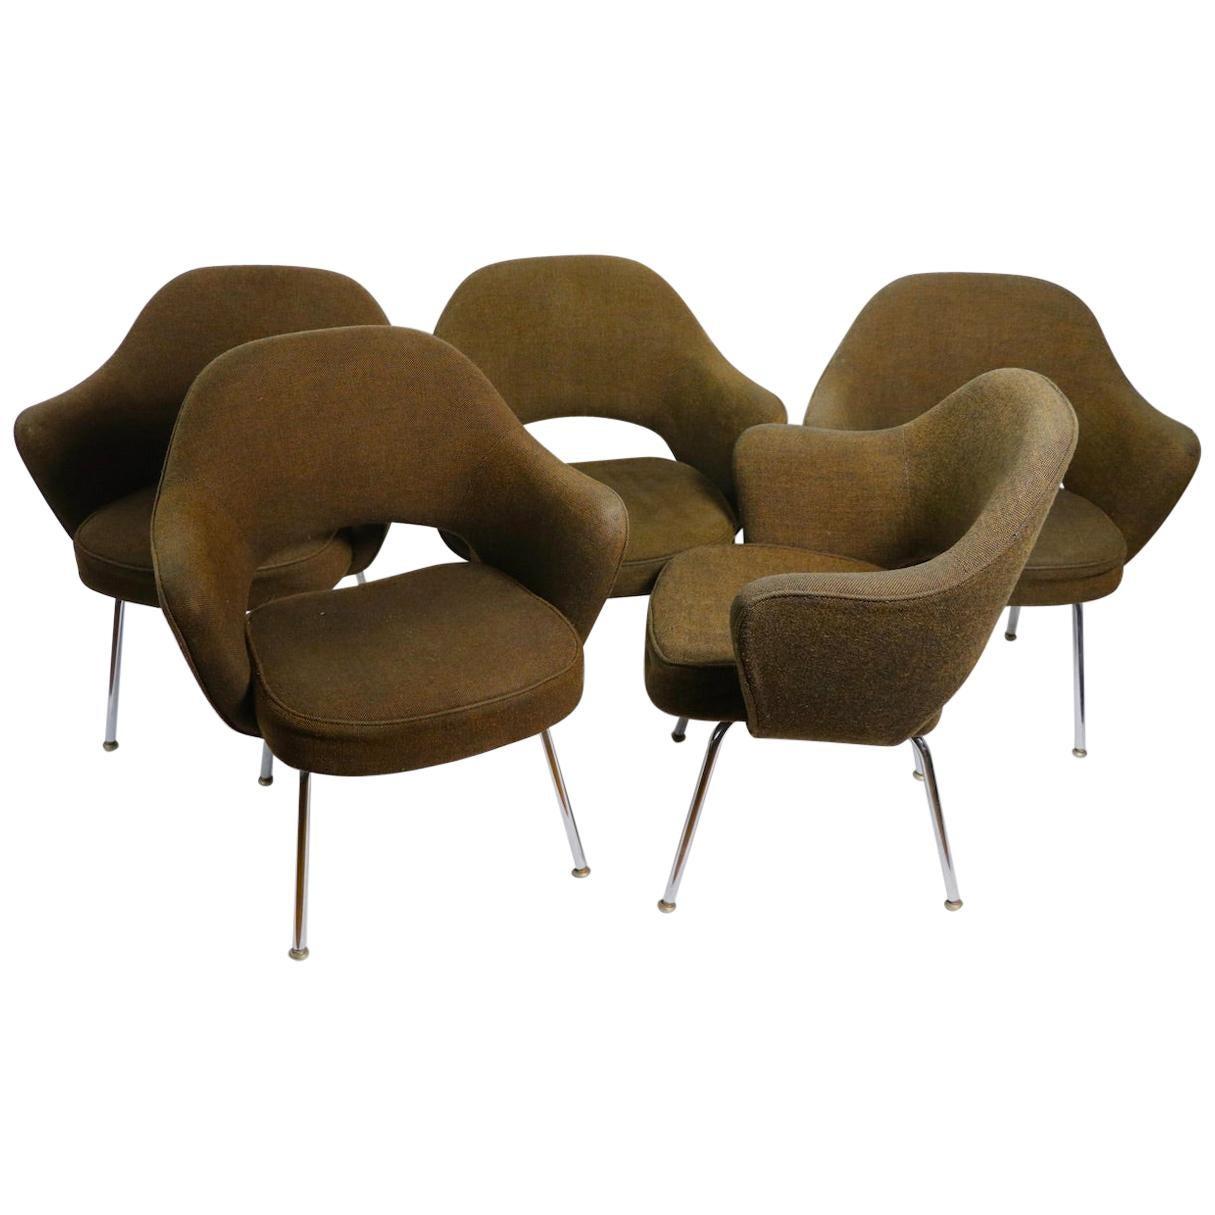 5 Saarinen Executive Chairs for Knoll